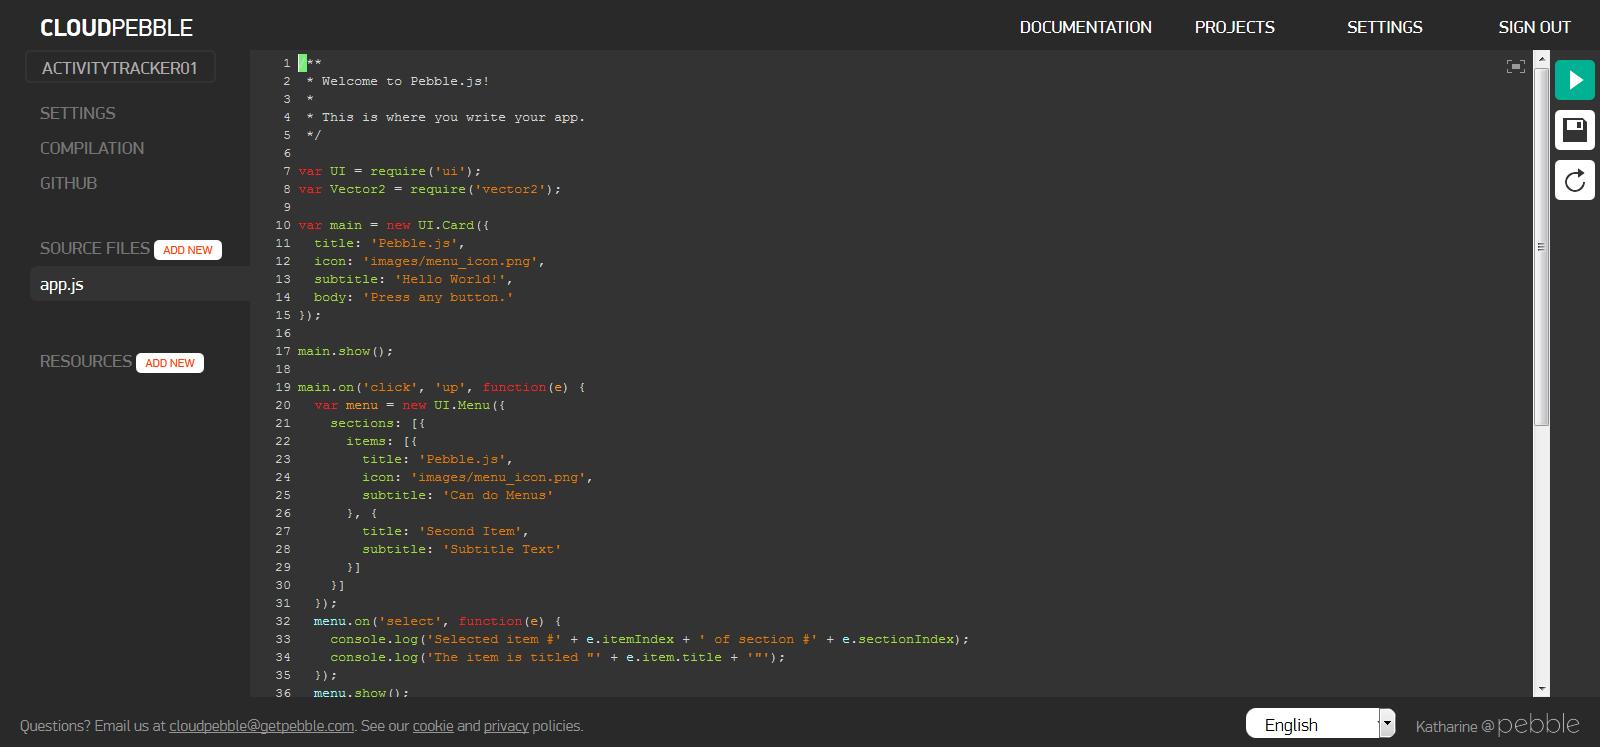 CloudPebble – ActivityTracker01.png